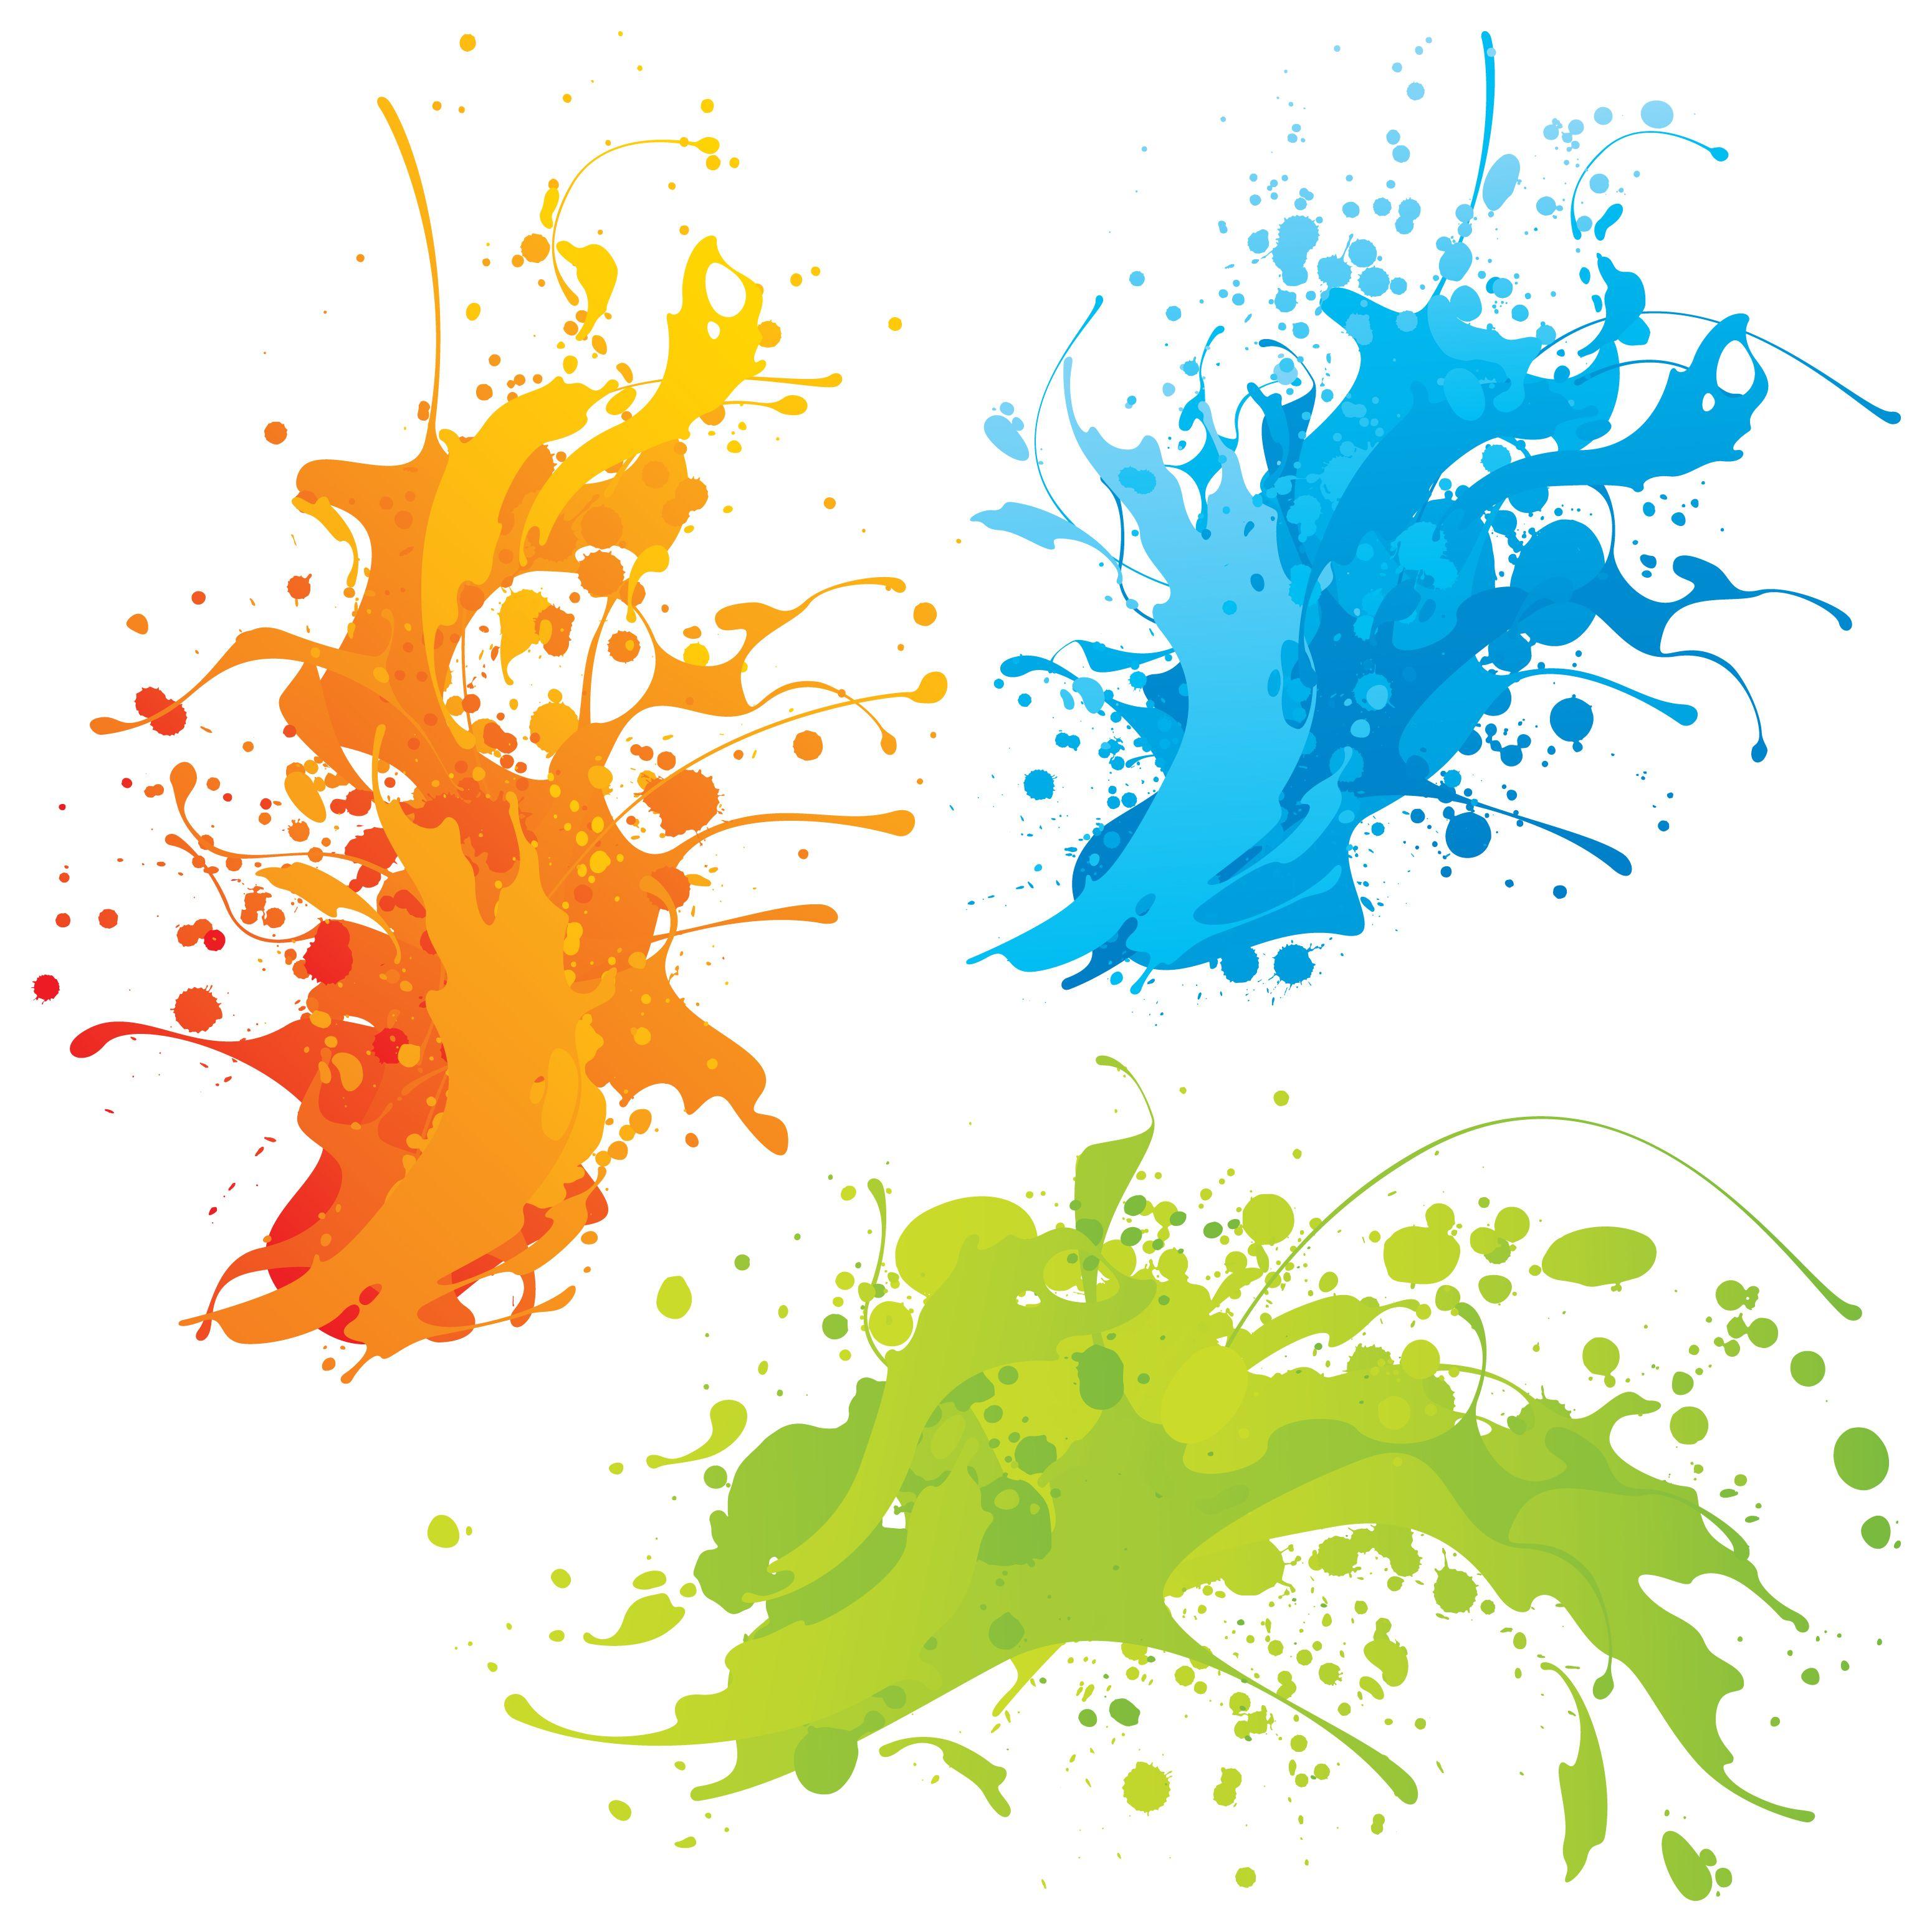 White Paint Splatter Png Watercolor Splash Paint Splash